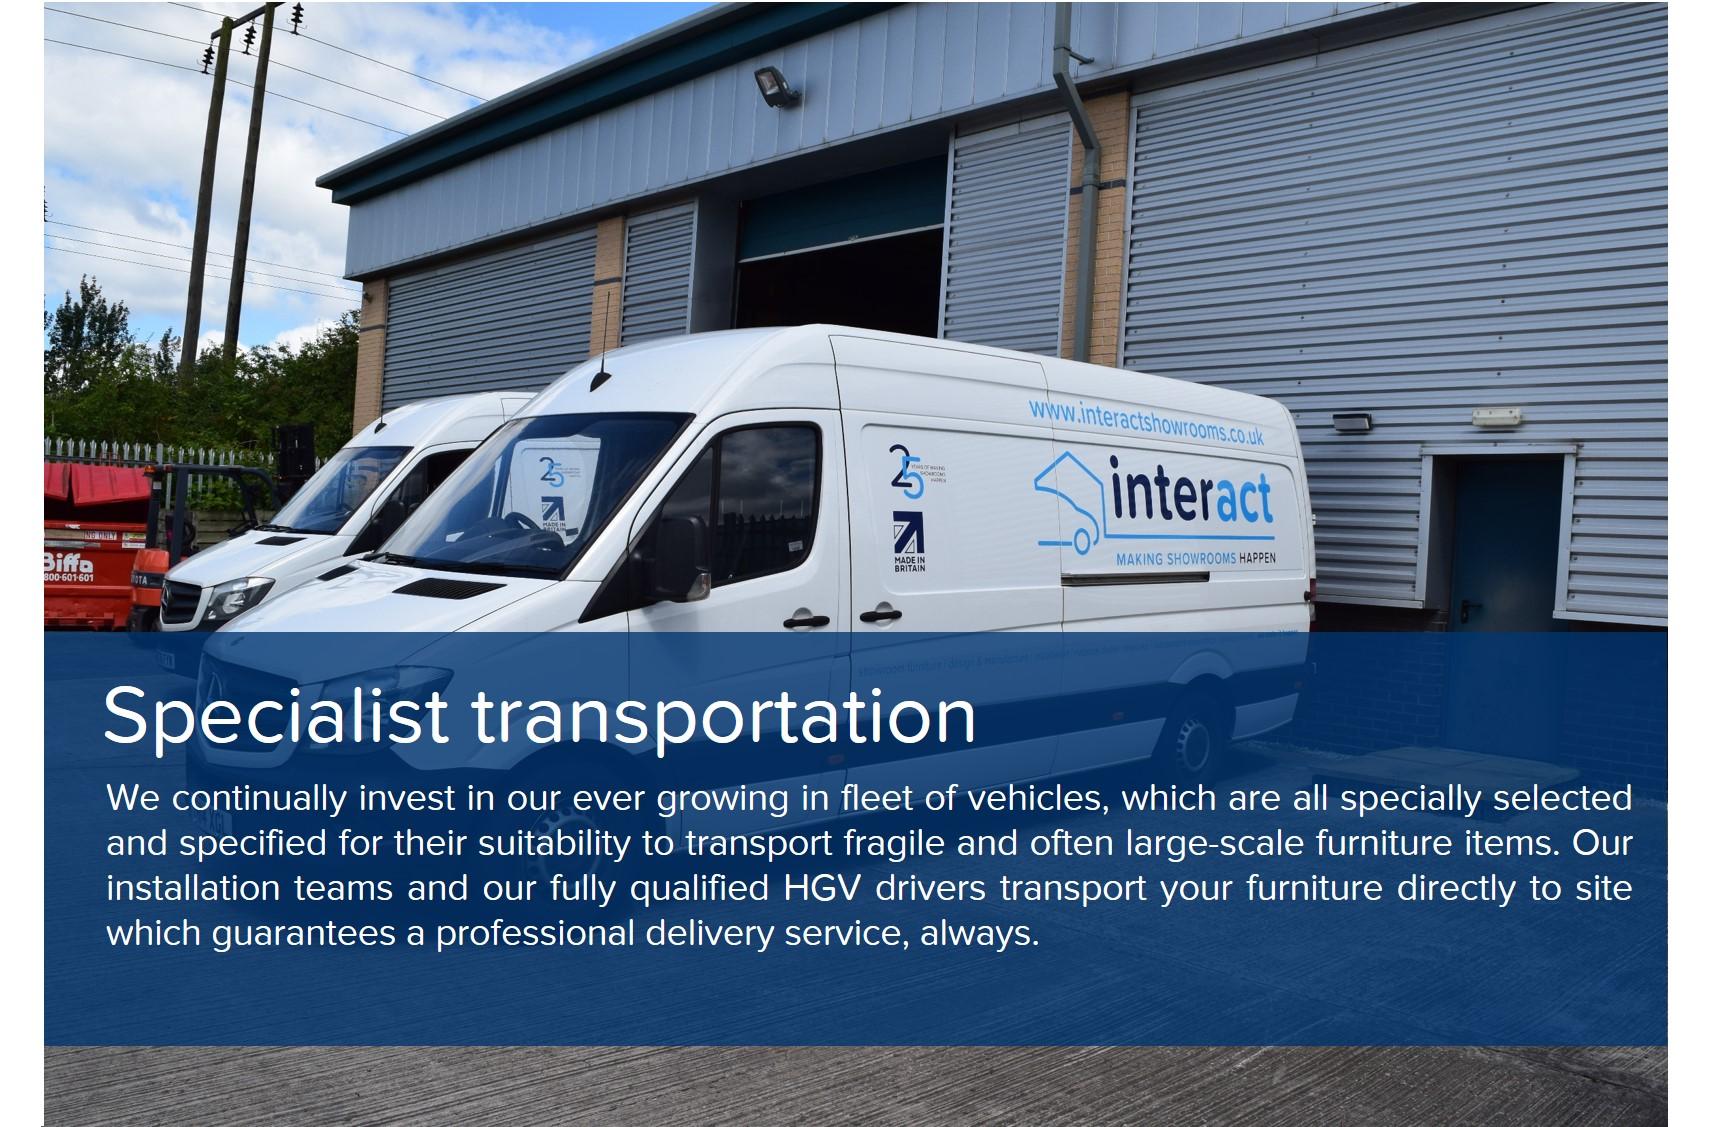 showroom design specialist transportation